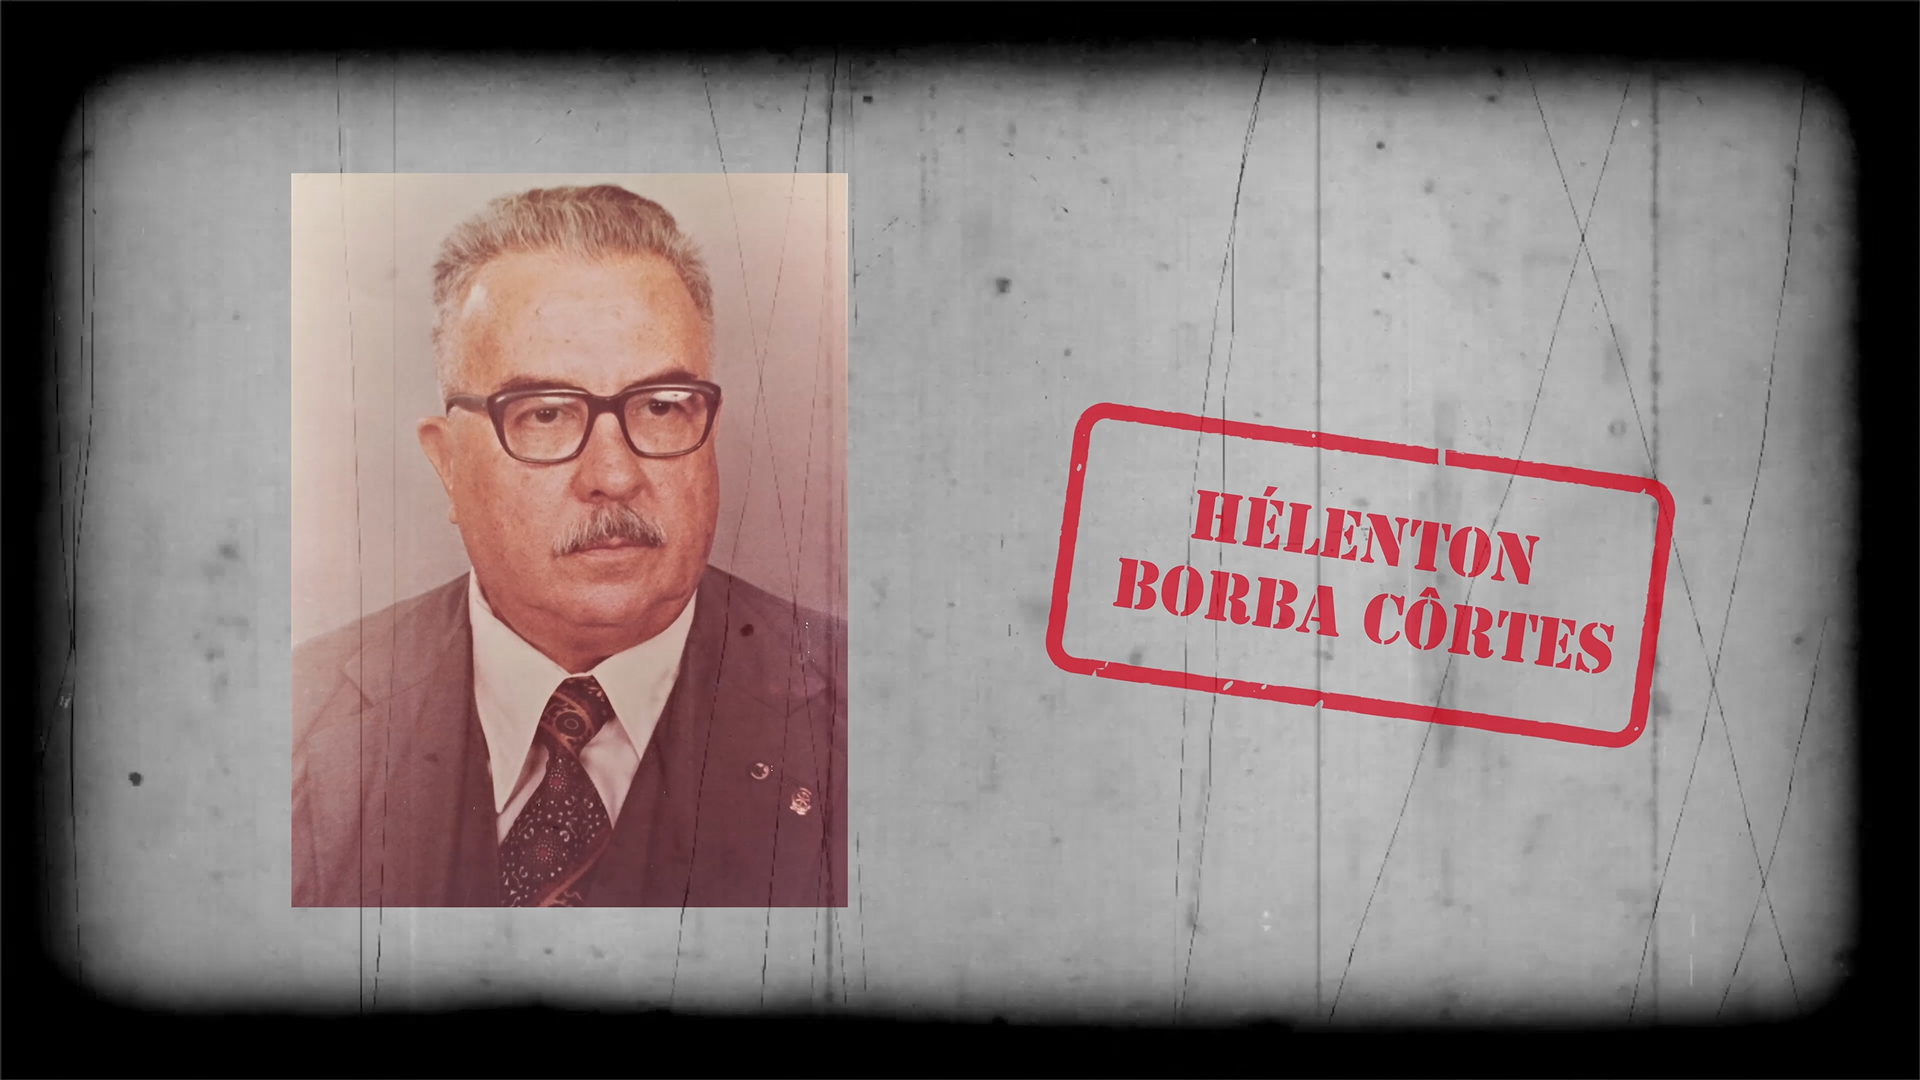 A história de Hélenton Borba Côrtes